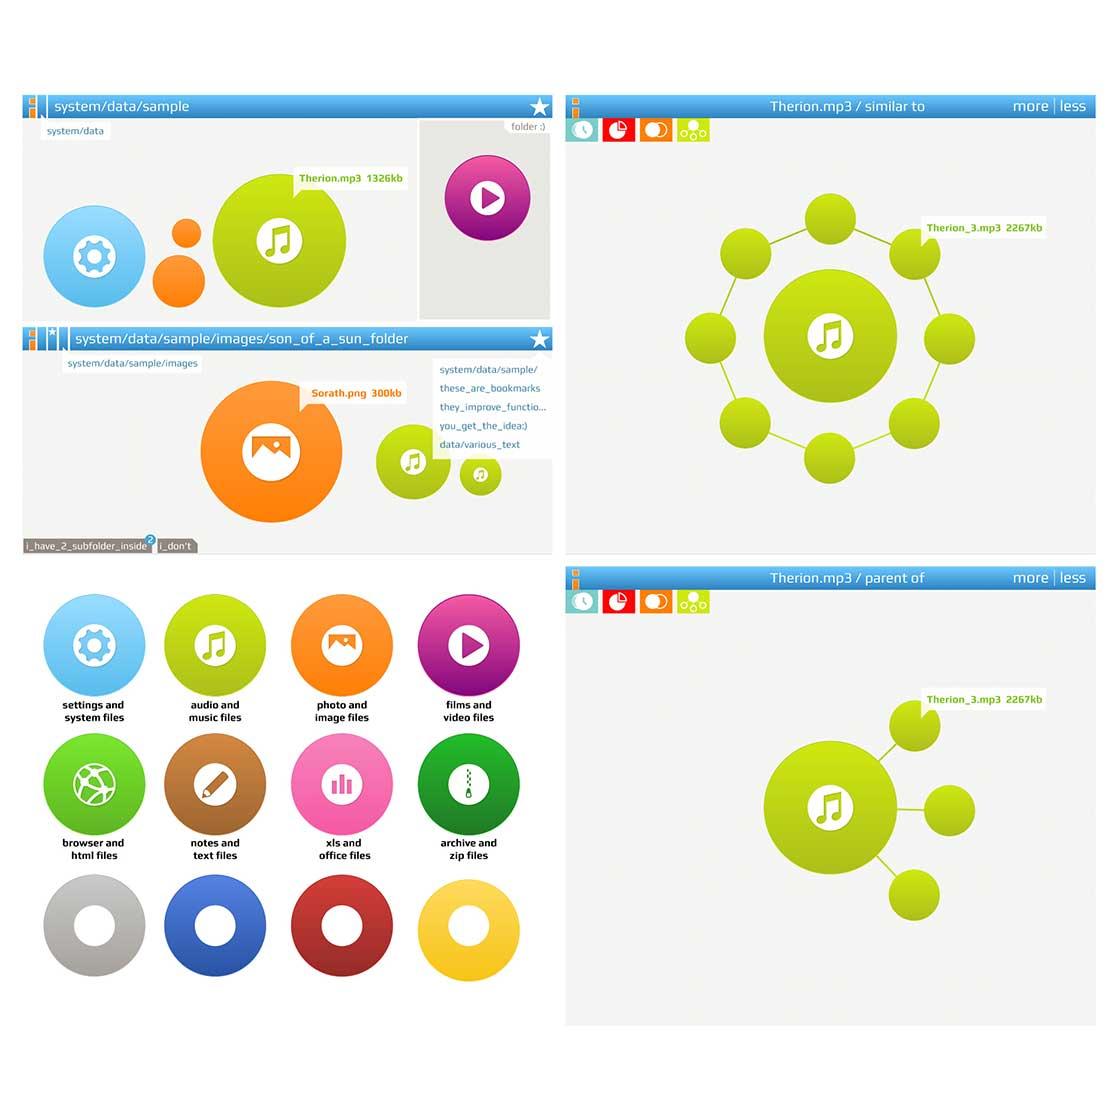 mobile UI designed by DarkFox2236